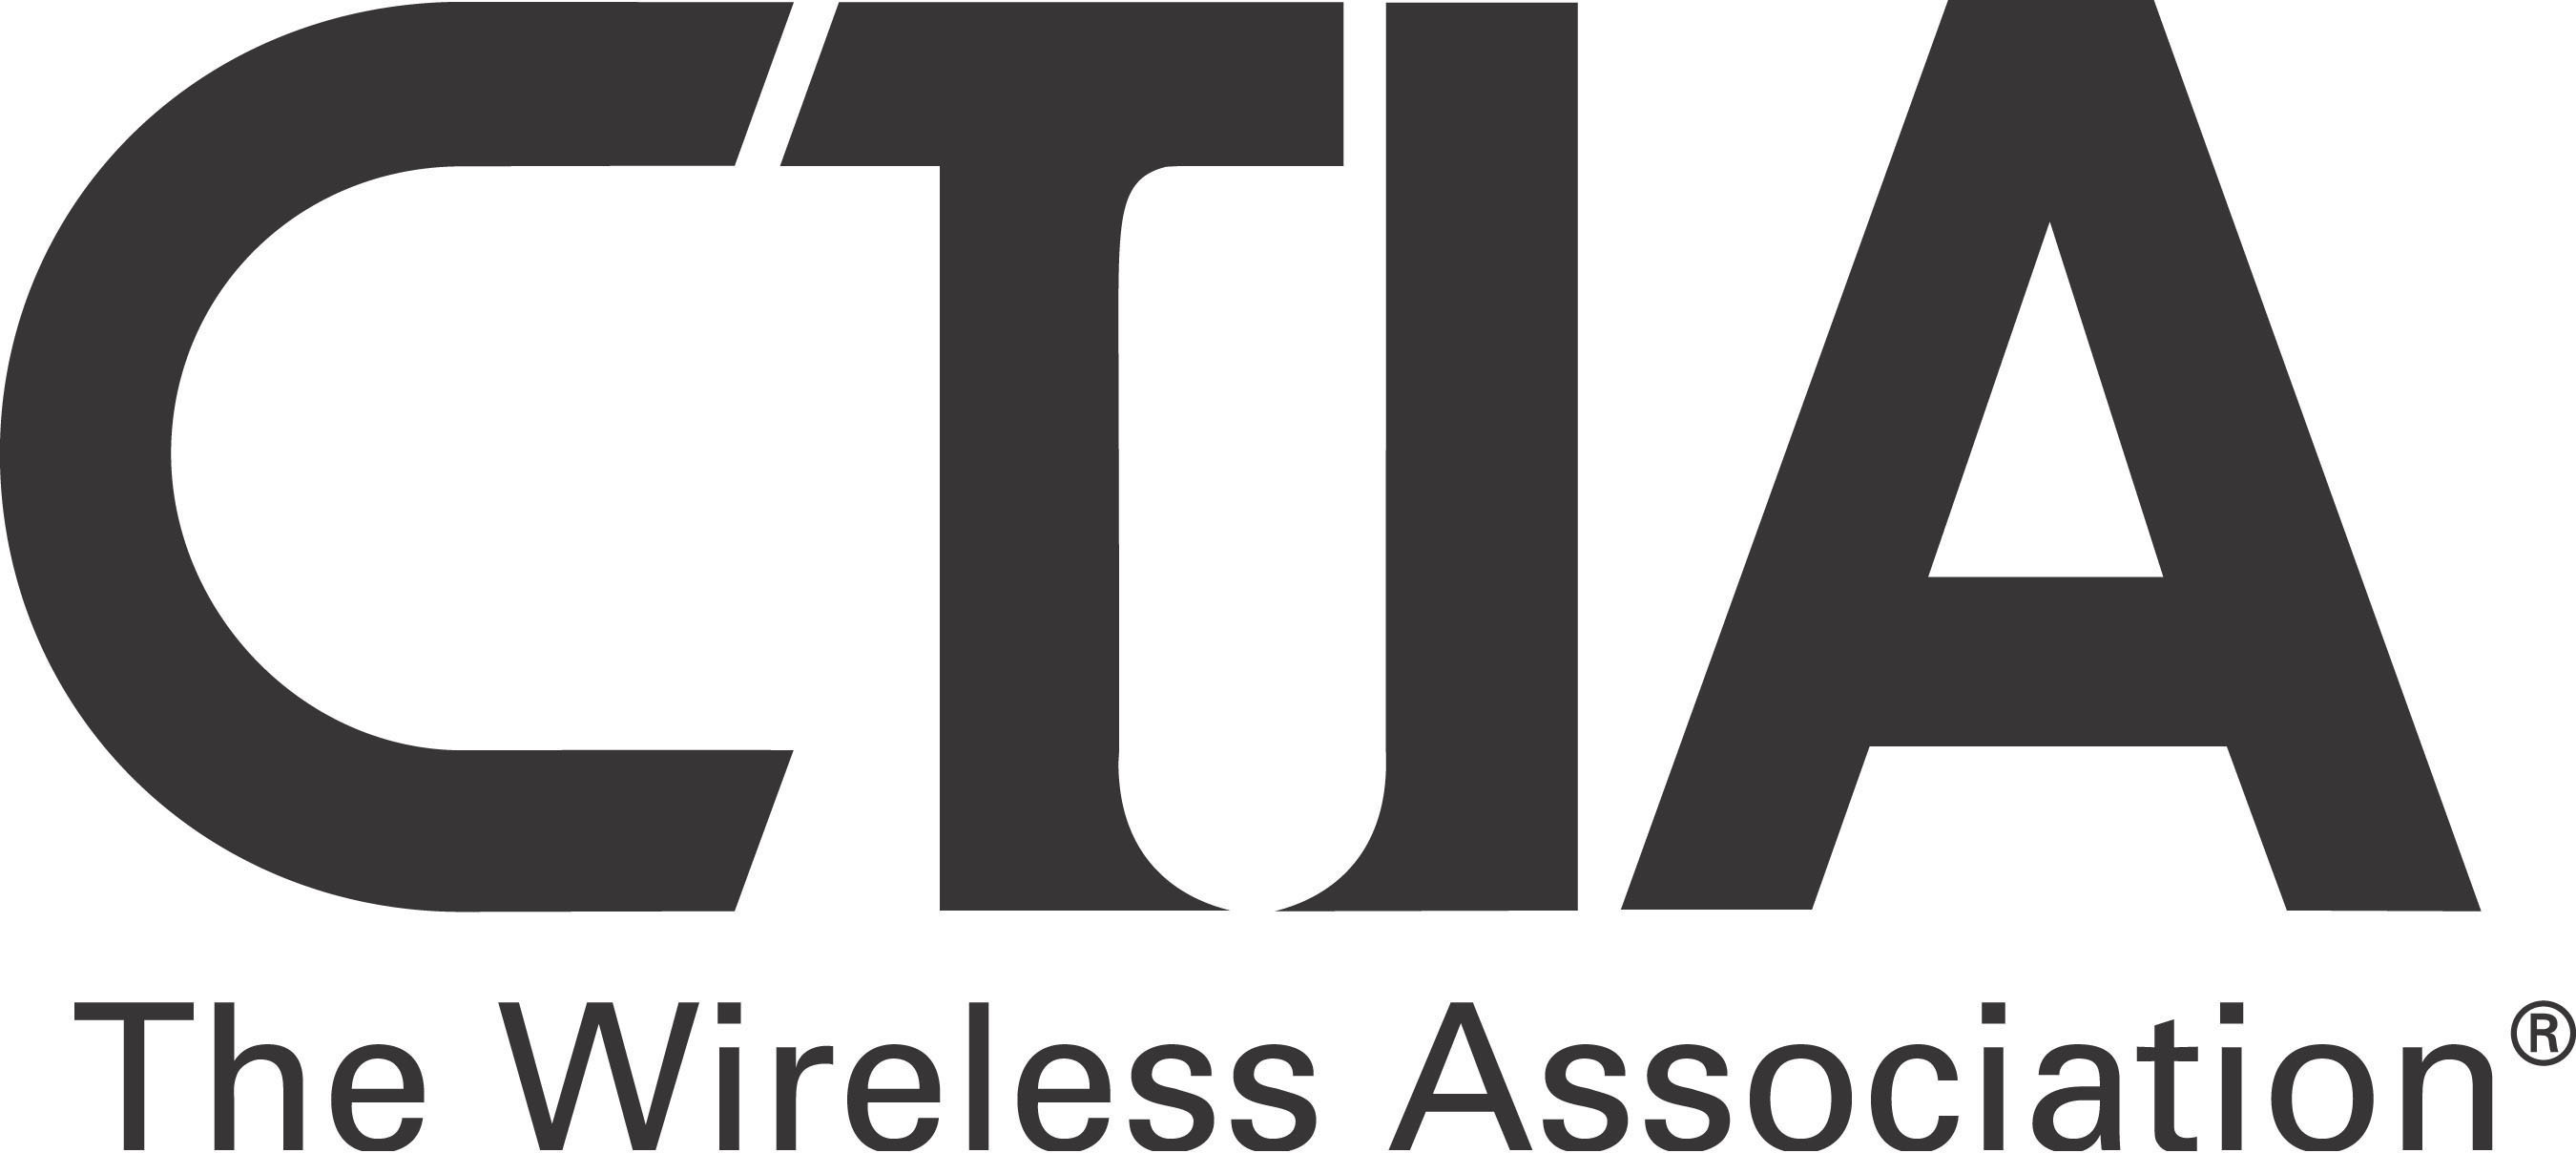 CTIA: The Wireless Association Logo.